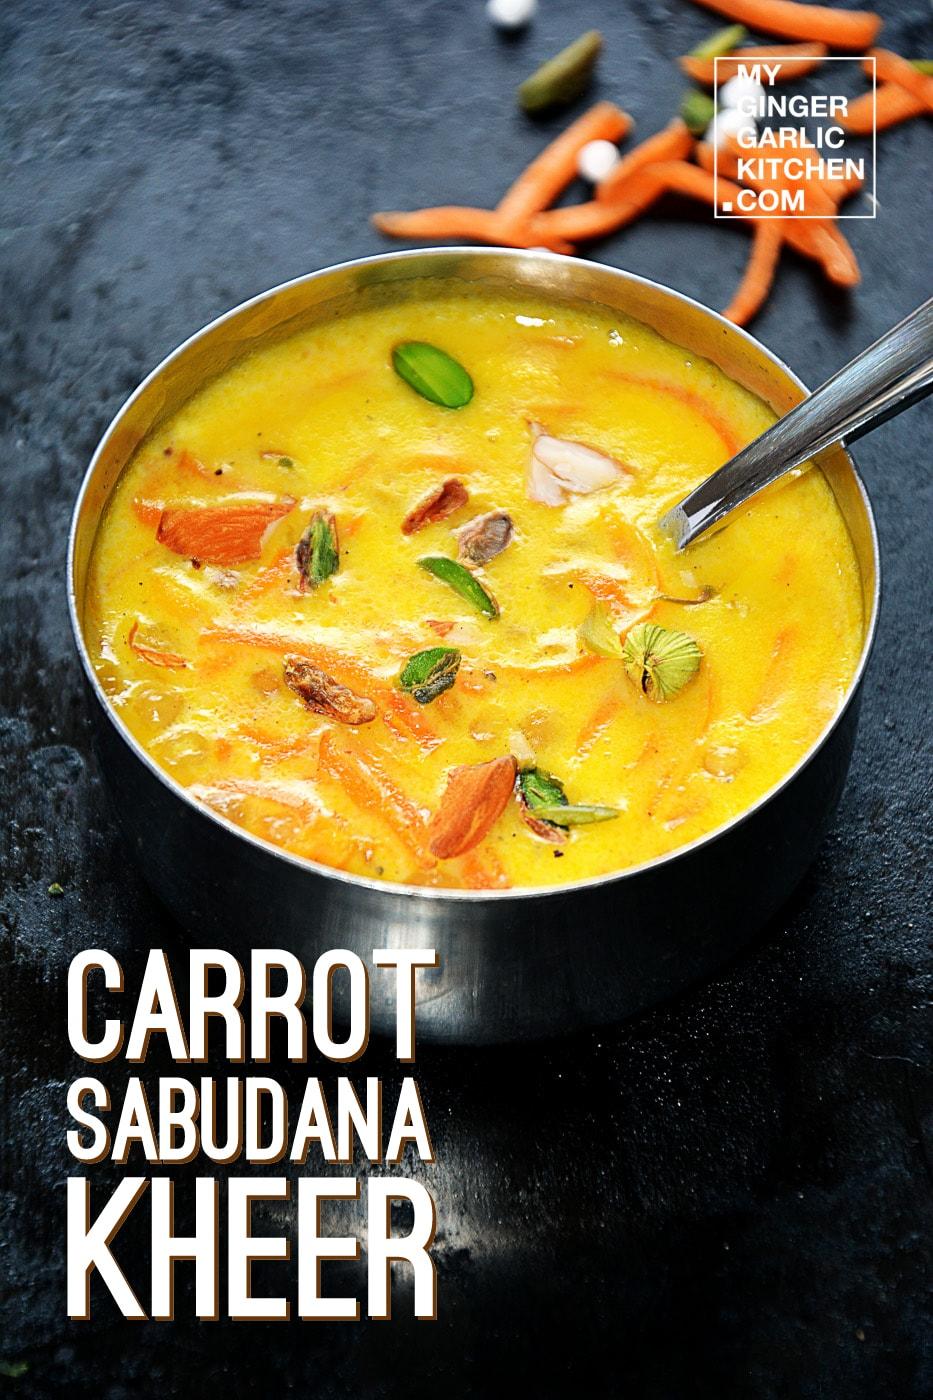 Image - recipe carrot sabudana kheer anupama paliwal 2